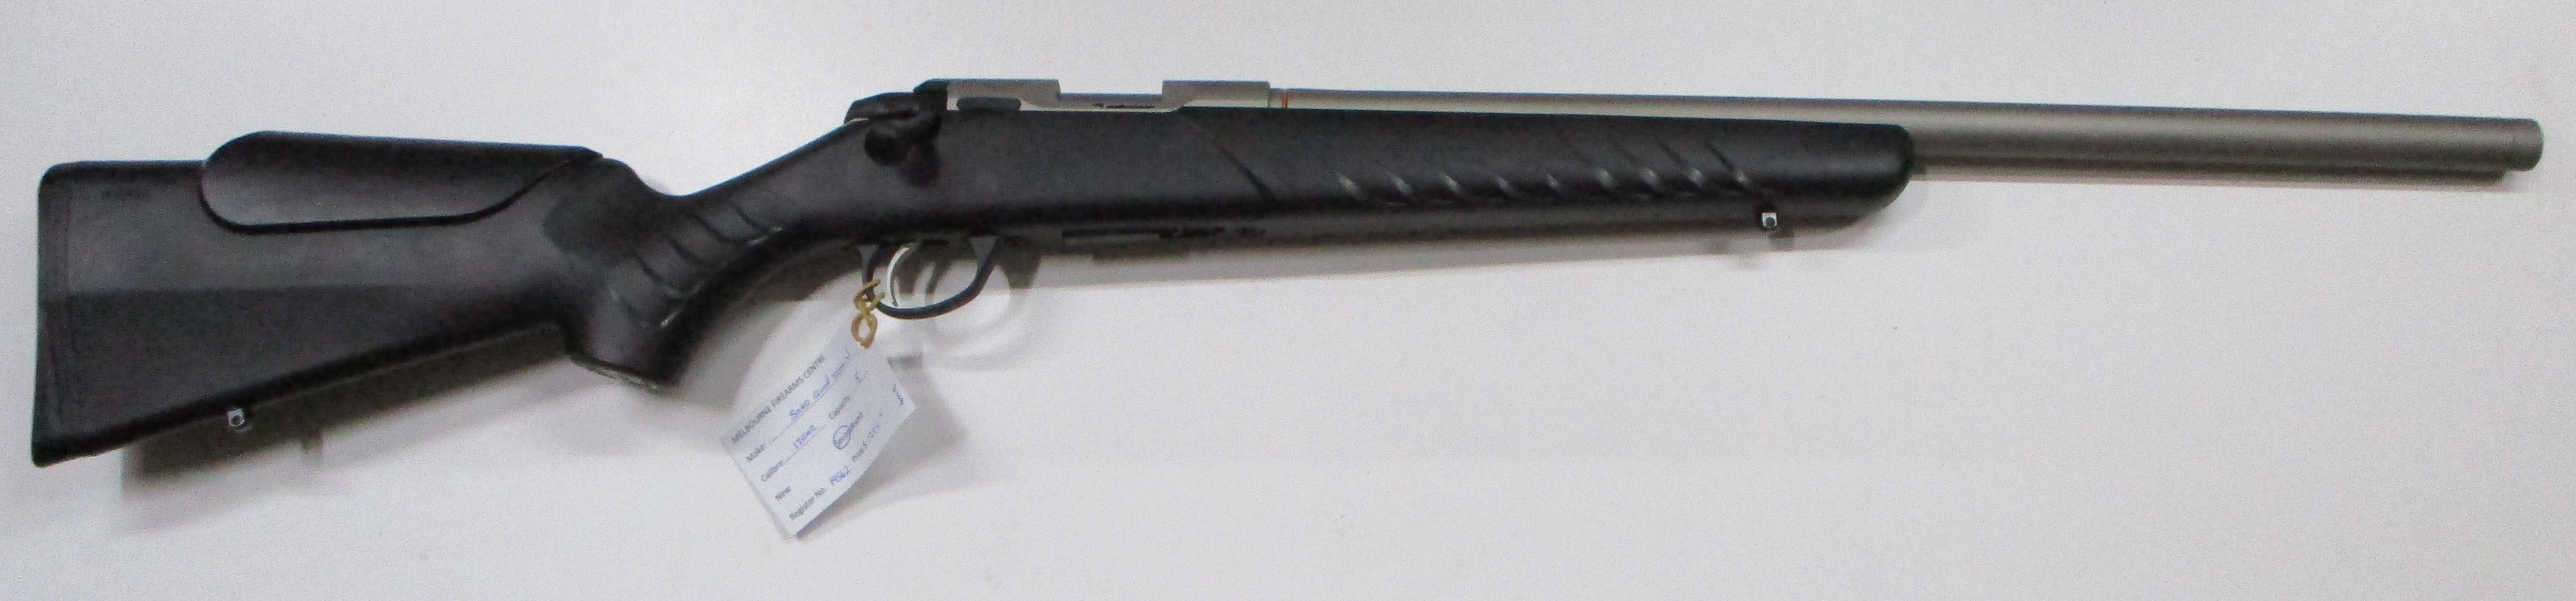 second hand firearms-shotguns-sporting rifles-rifles-centre